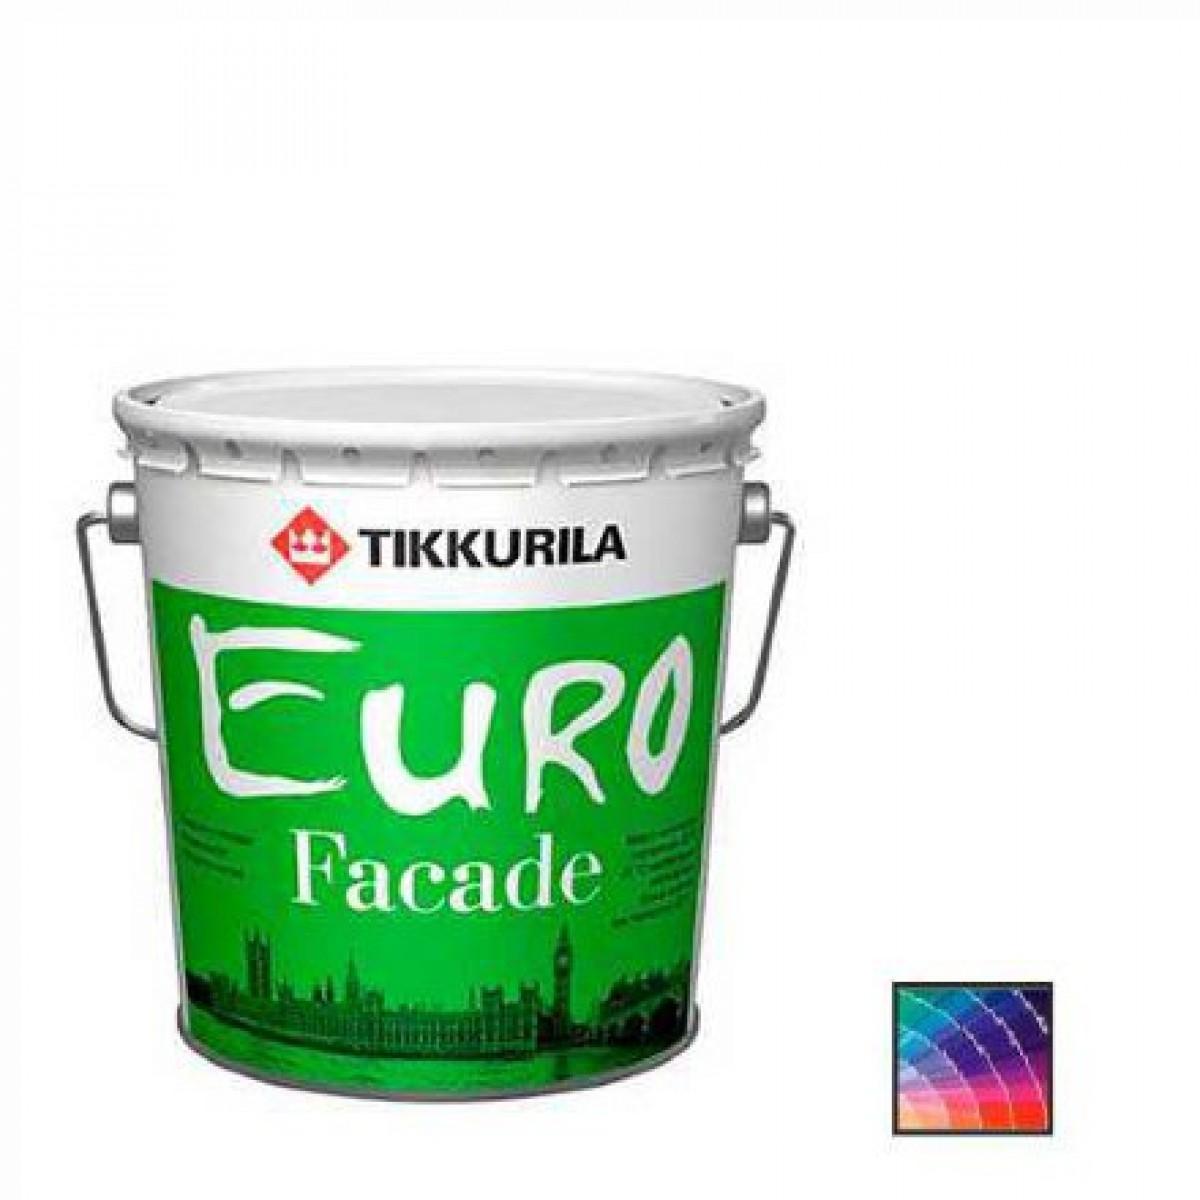 Краска фасадная Tikkurila Euro Facade КА краска фасадная 9 л ЗИМА